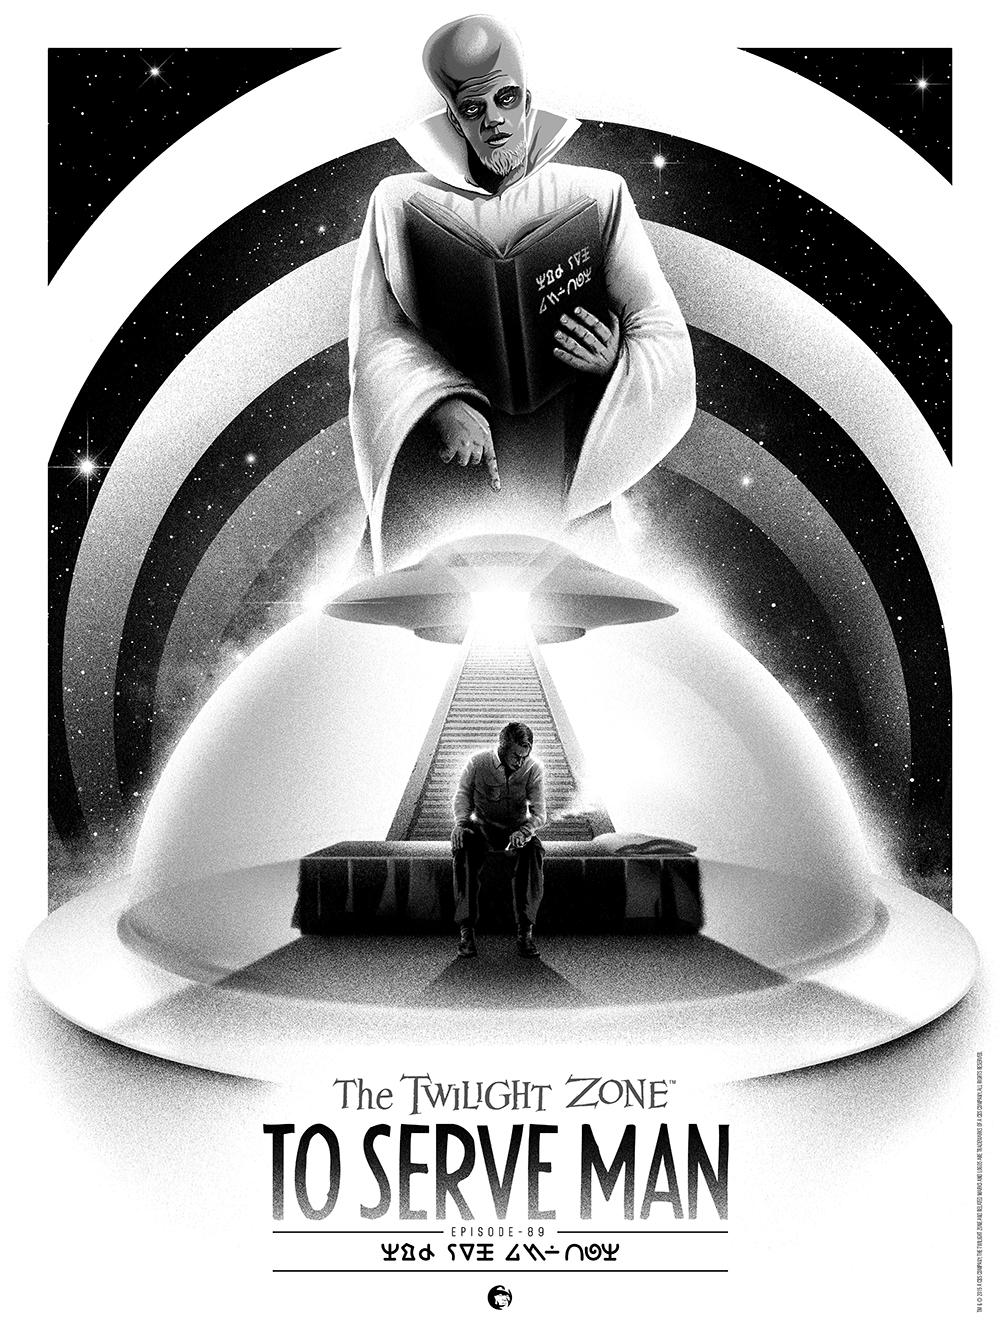 The twilight zone to serve man 18x24 regular jpg